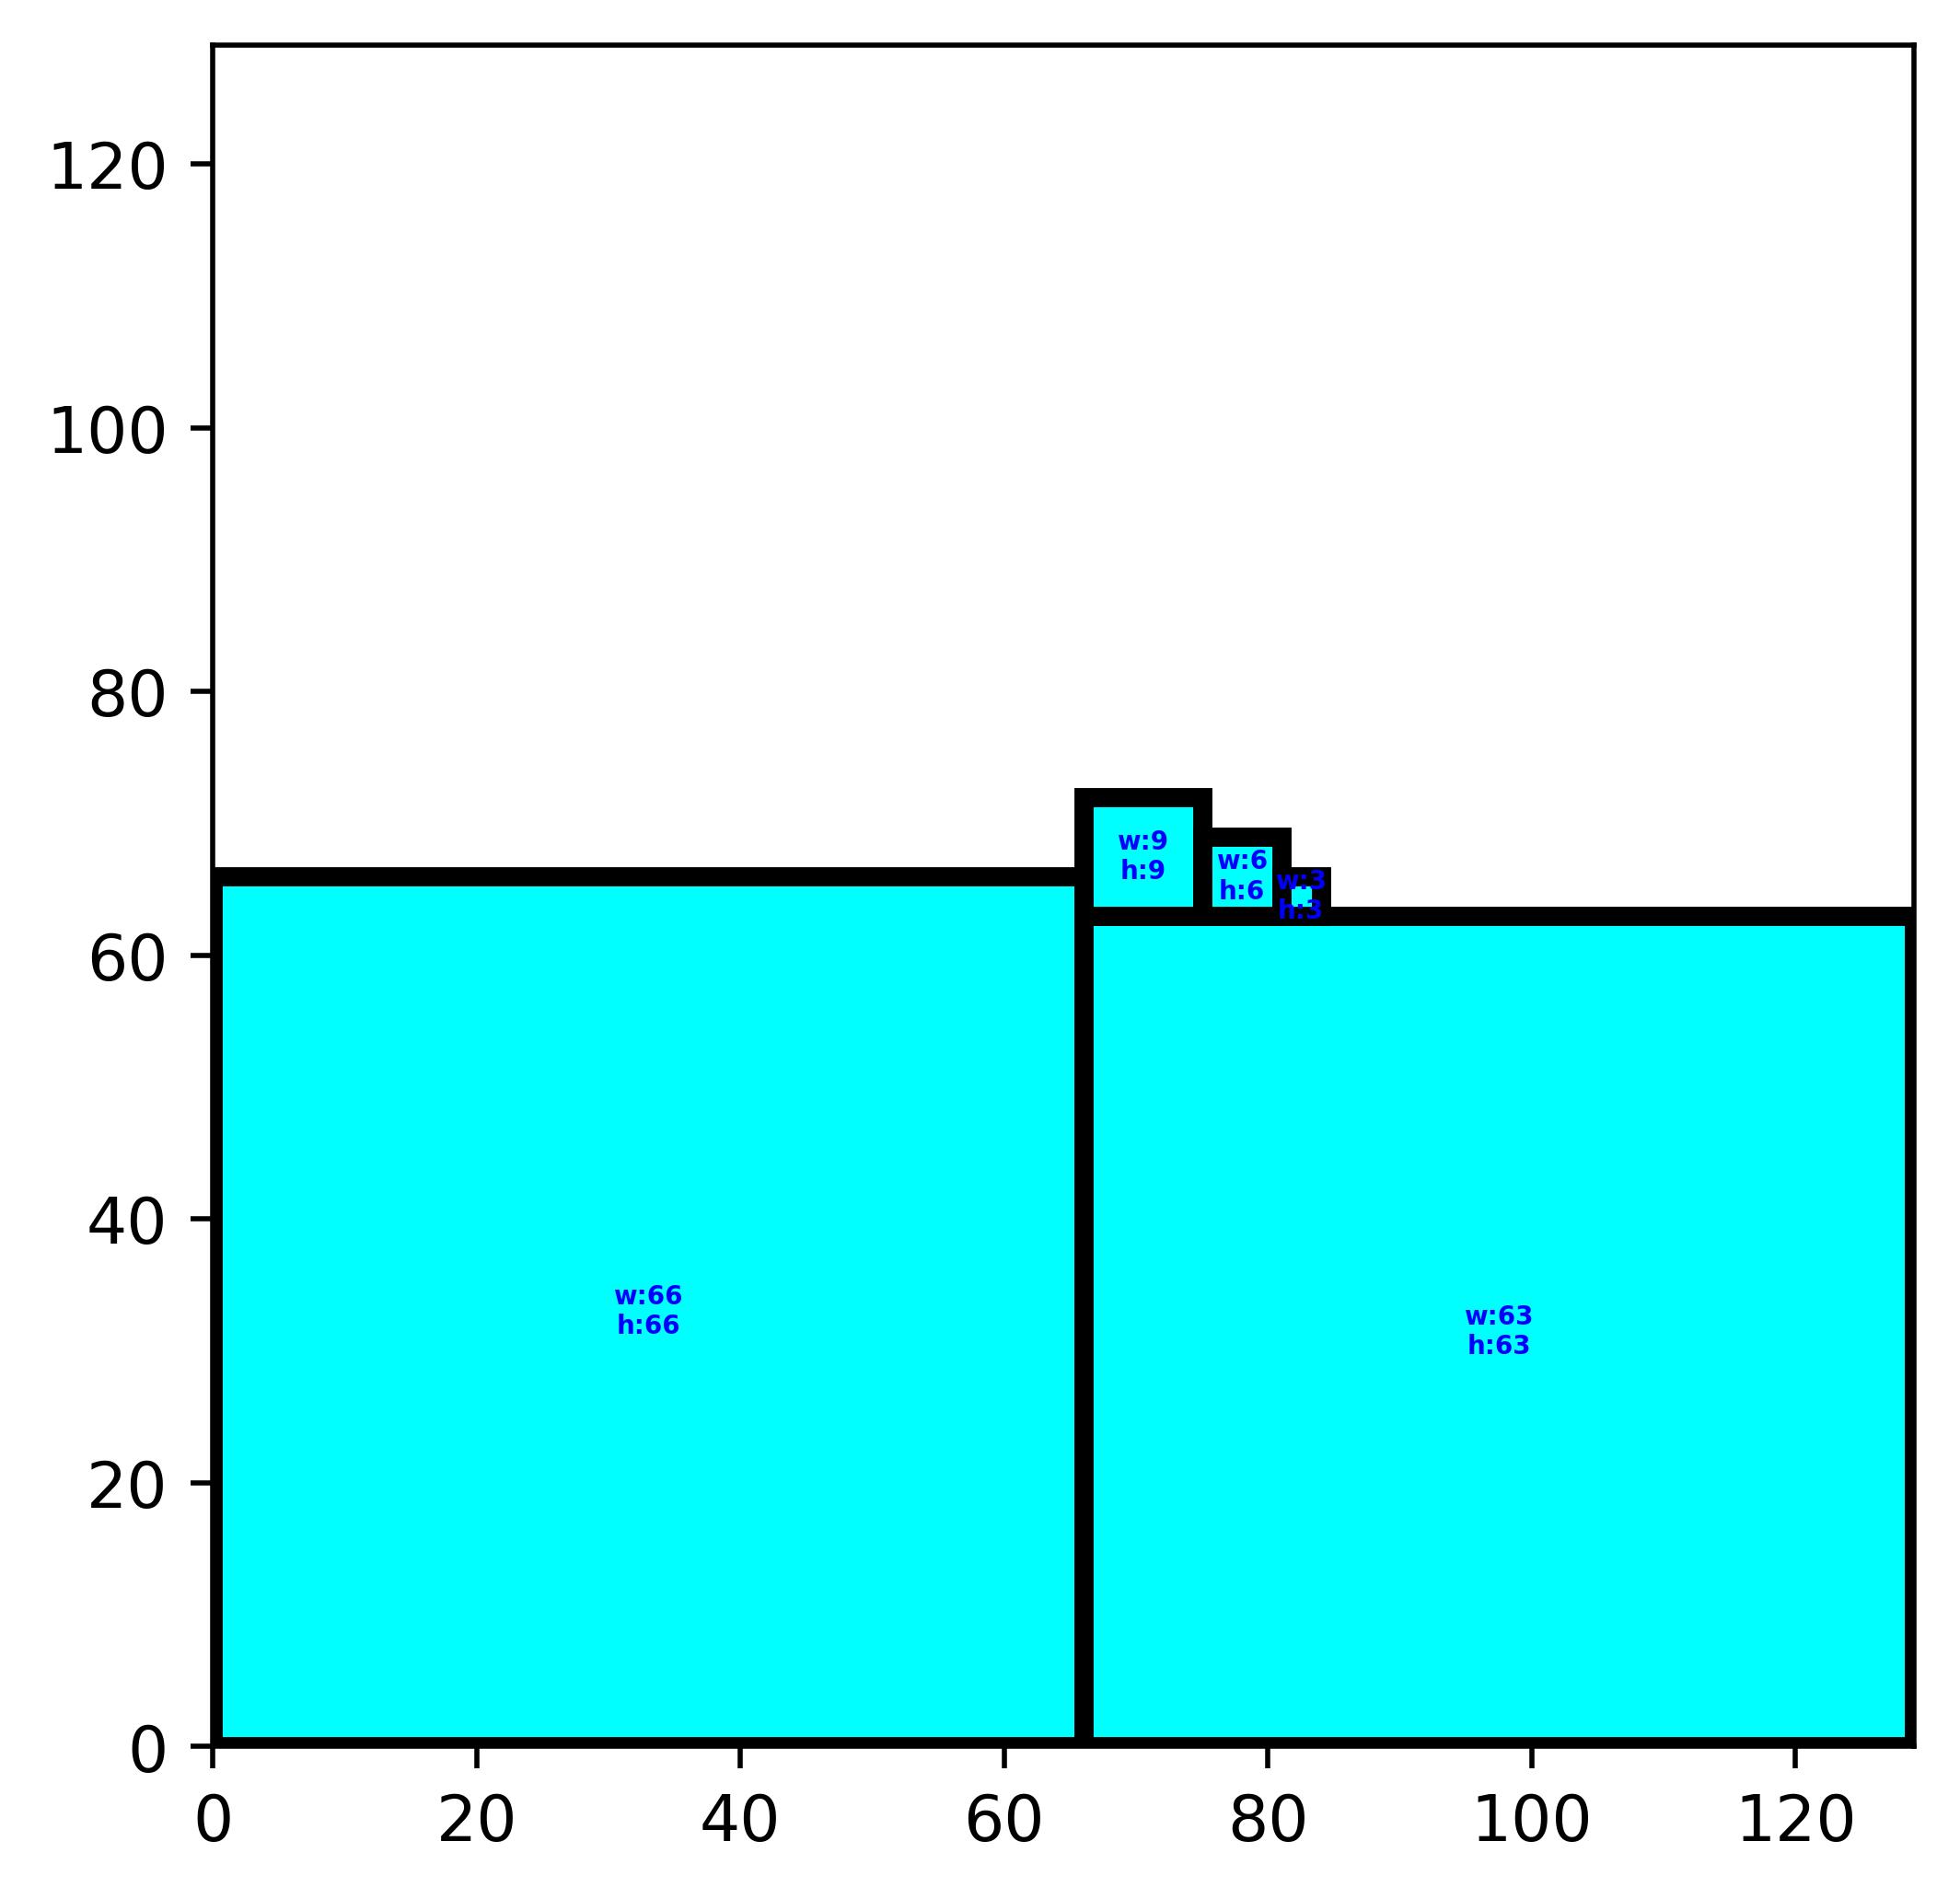 optimization_algo/packing_screenshots/AlphaGoZero/pack_size_129/penalty_constant_0/k=5_max=17280_latency=102617.png